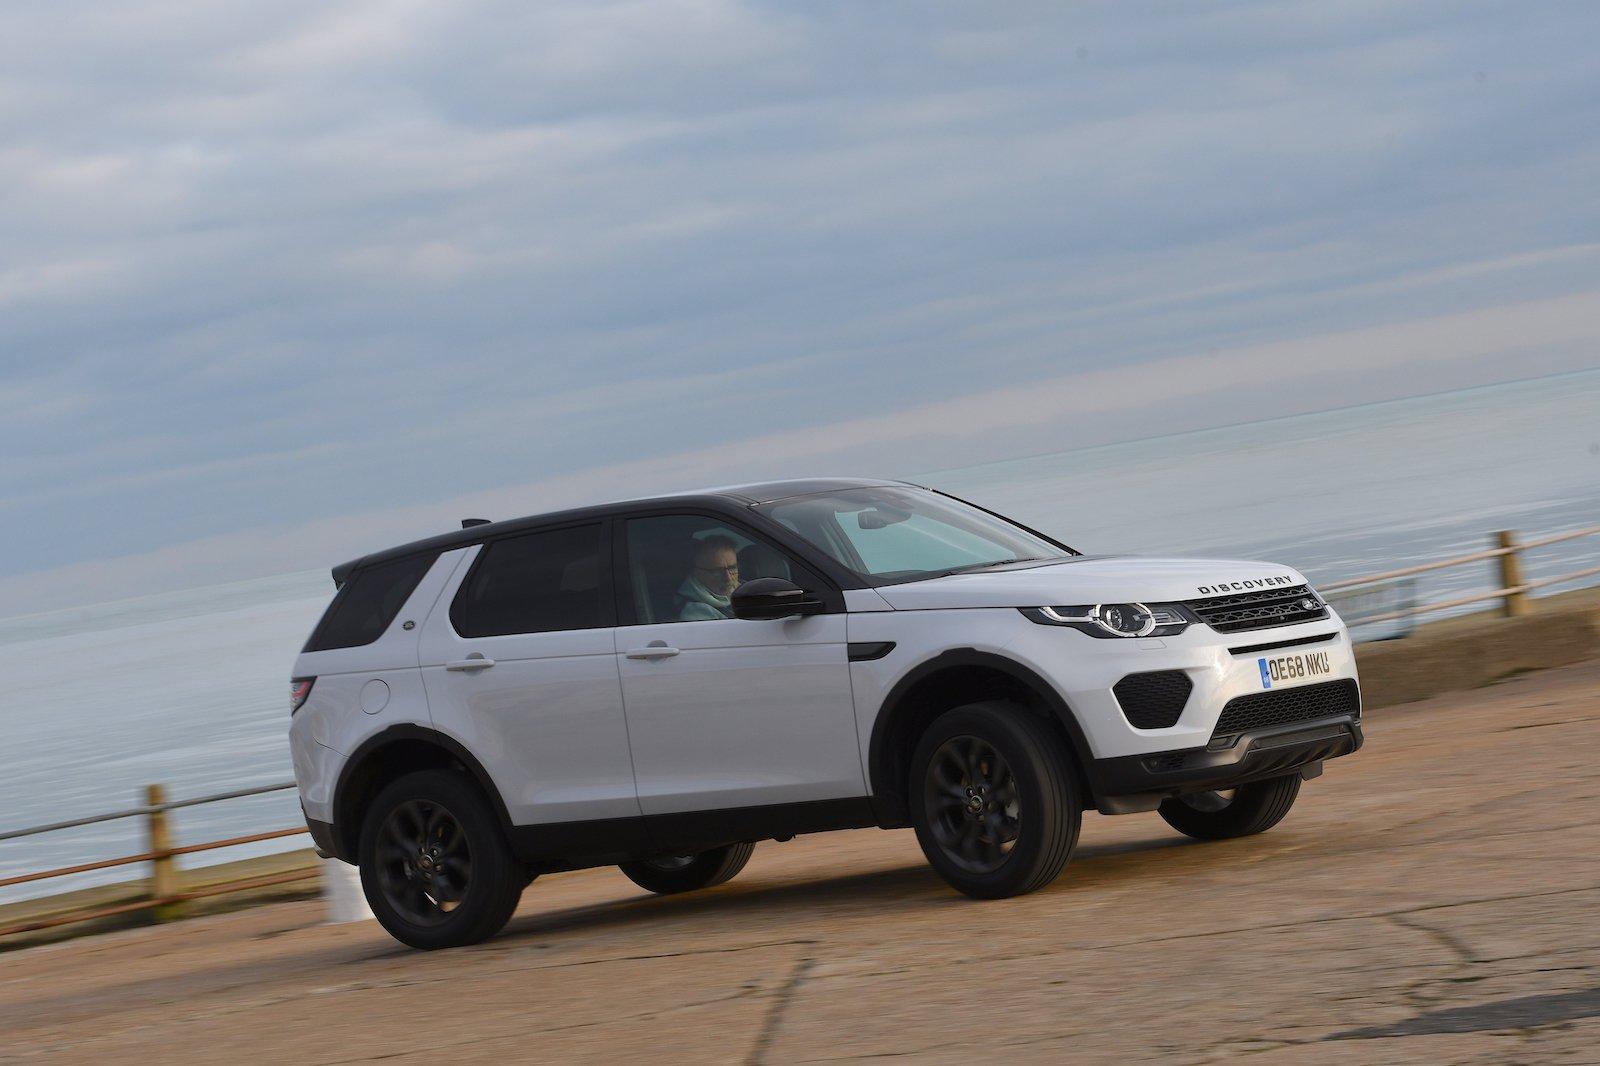 2019 Land Rover Discovery Sport Landmark side